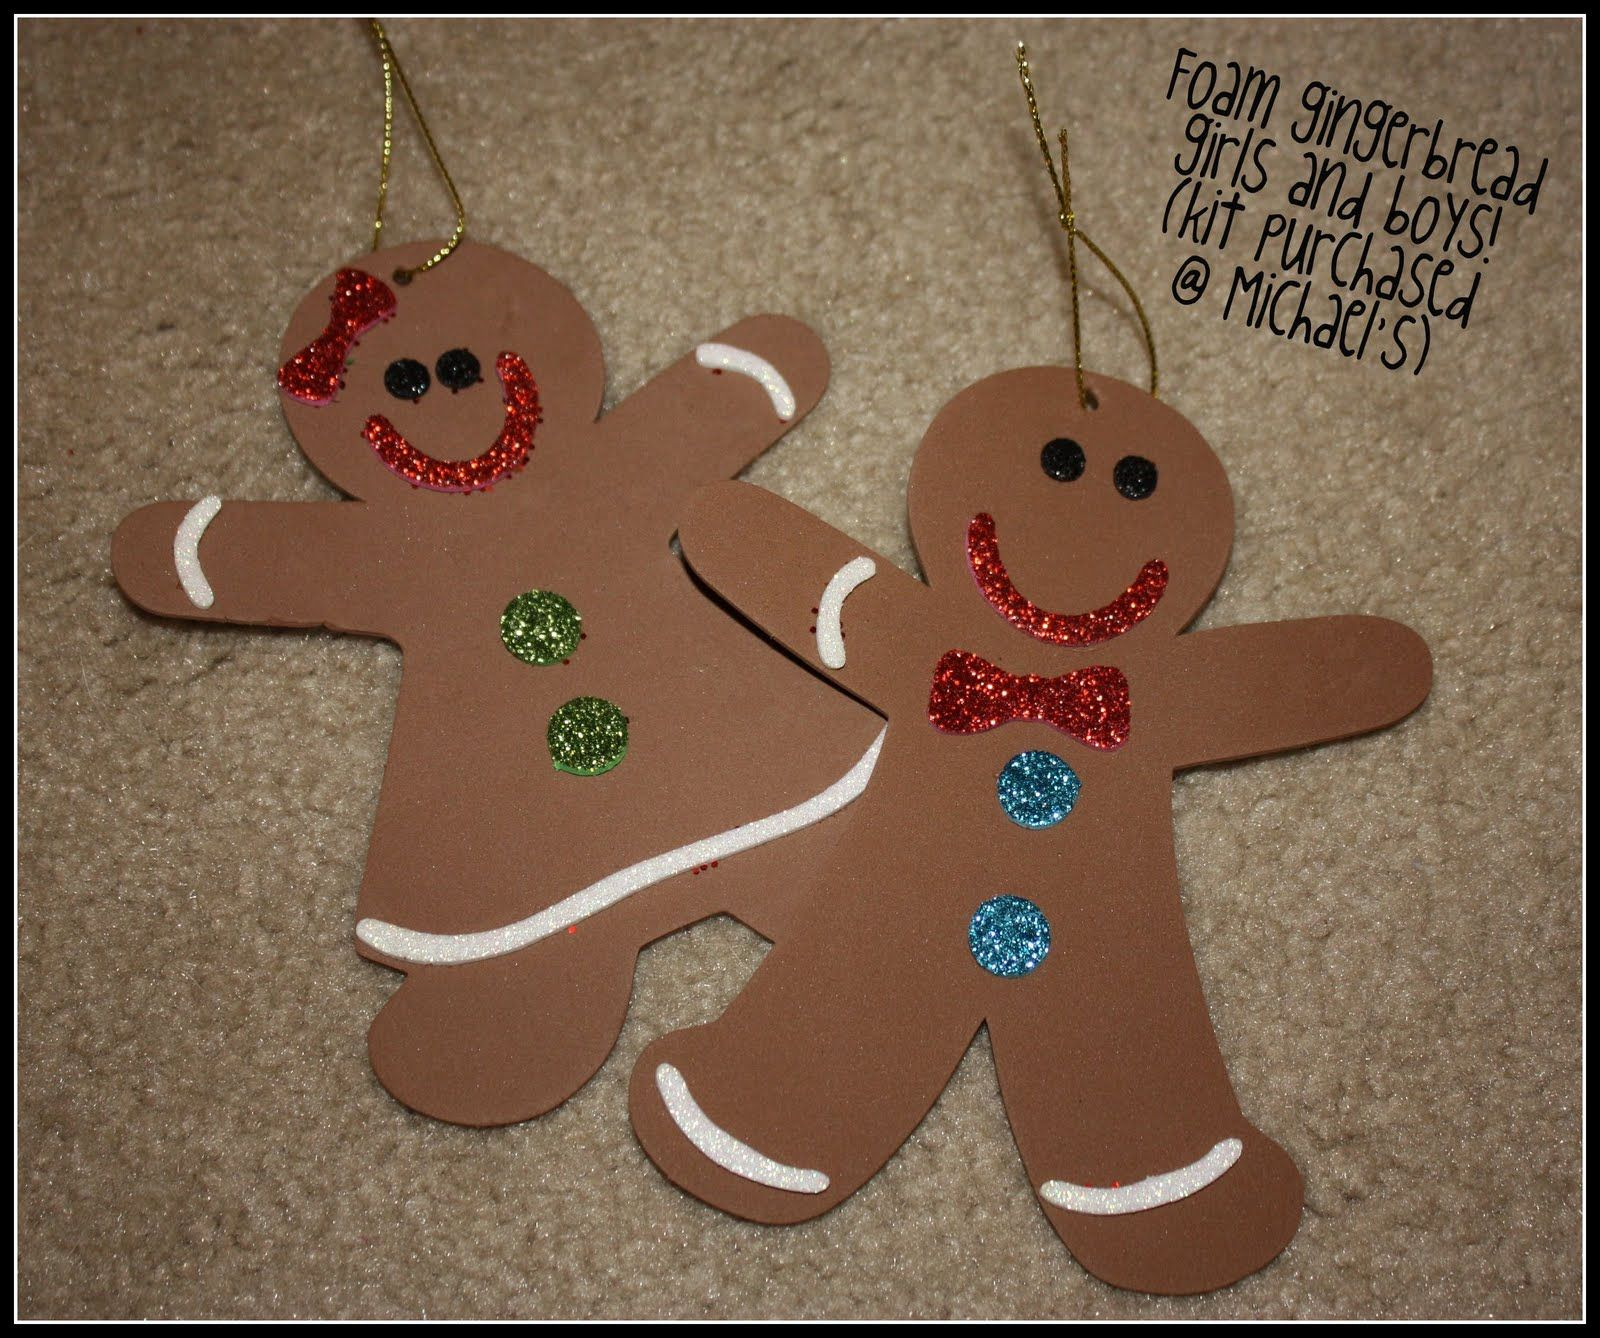 Michaels Christmas Crafts.Foam Gingerbread Ornaments Michaels Kit Classroom Ideas